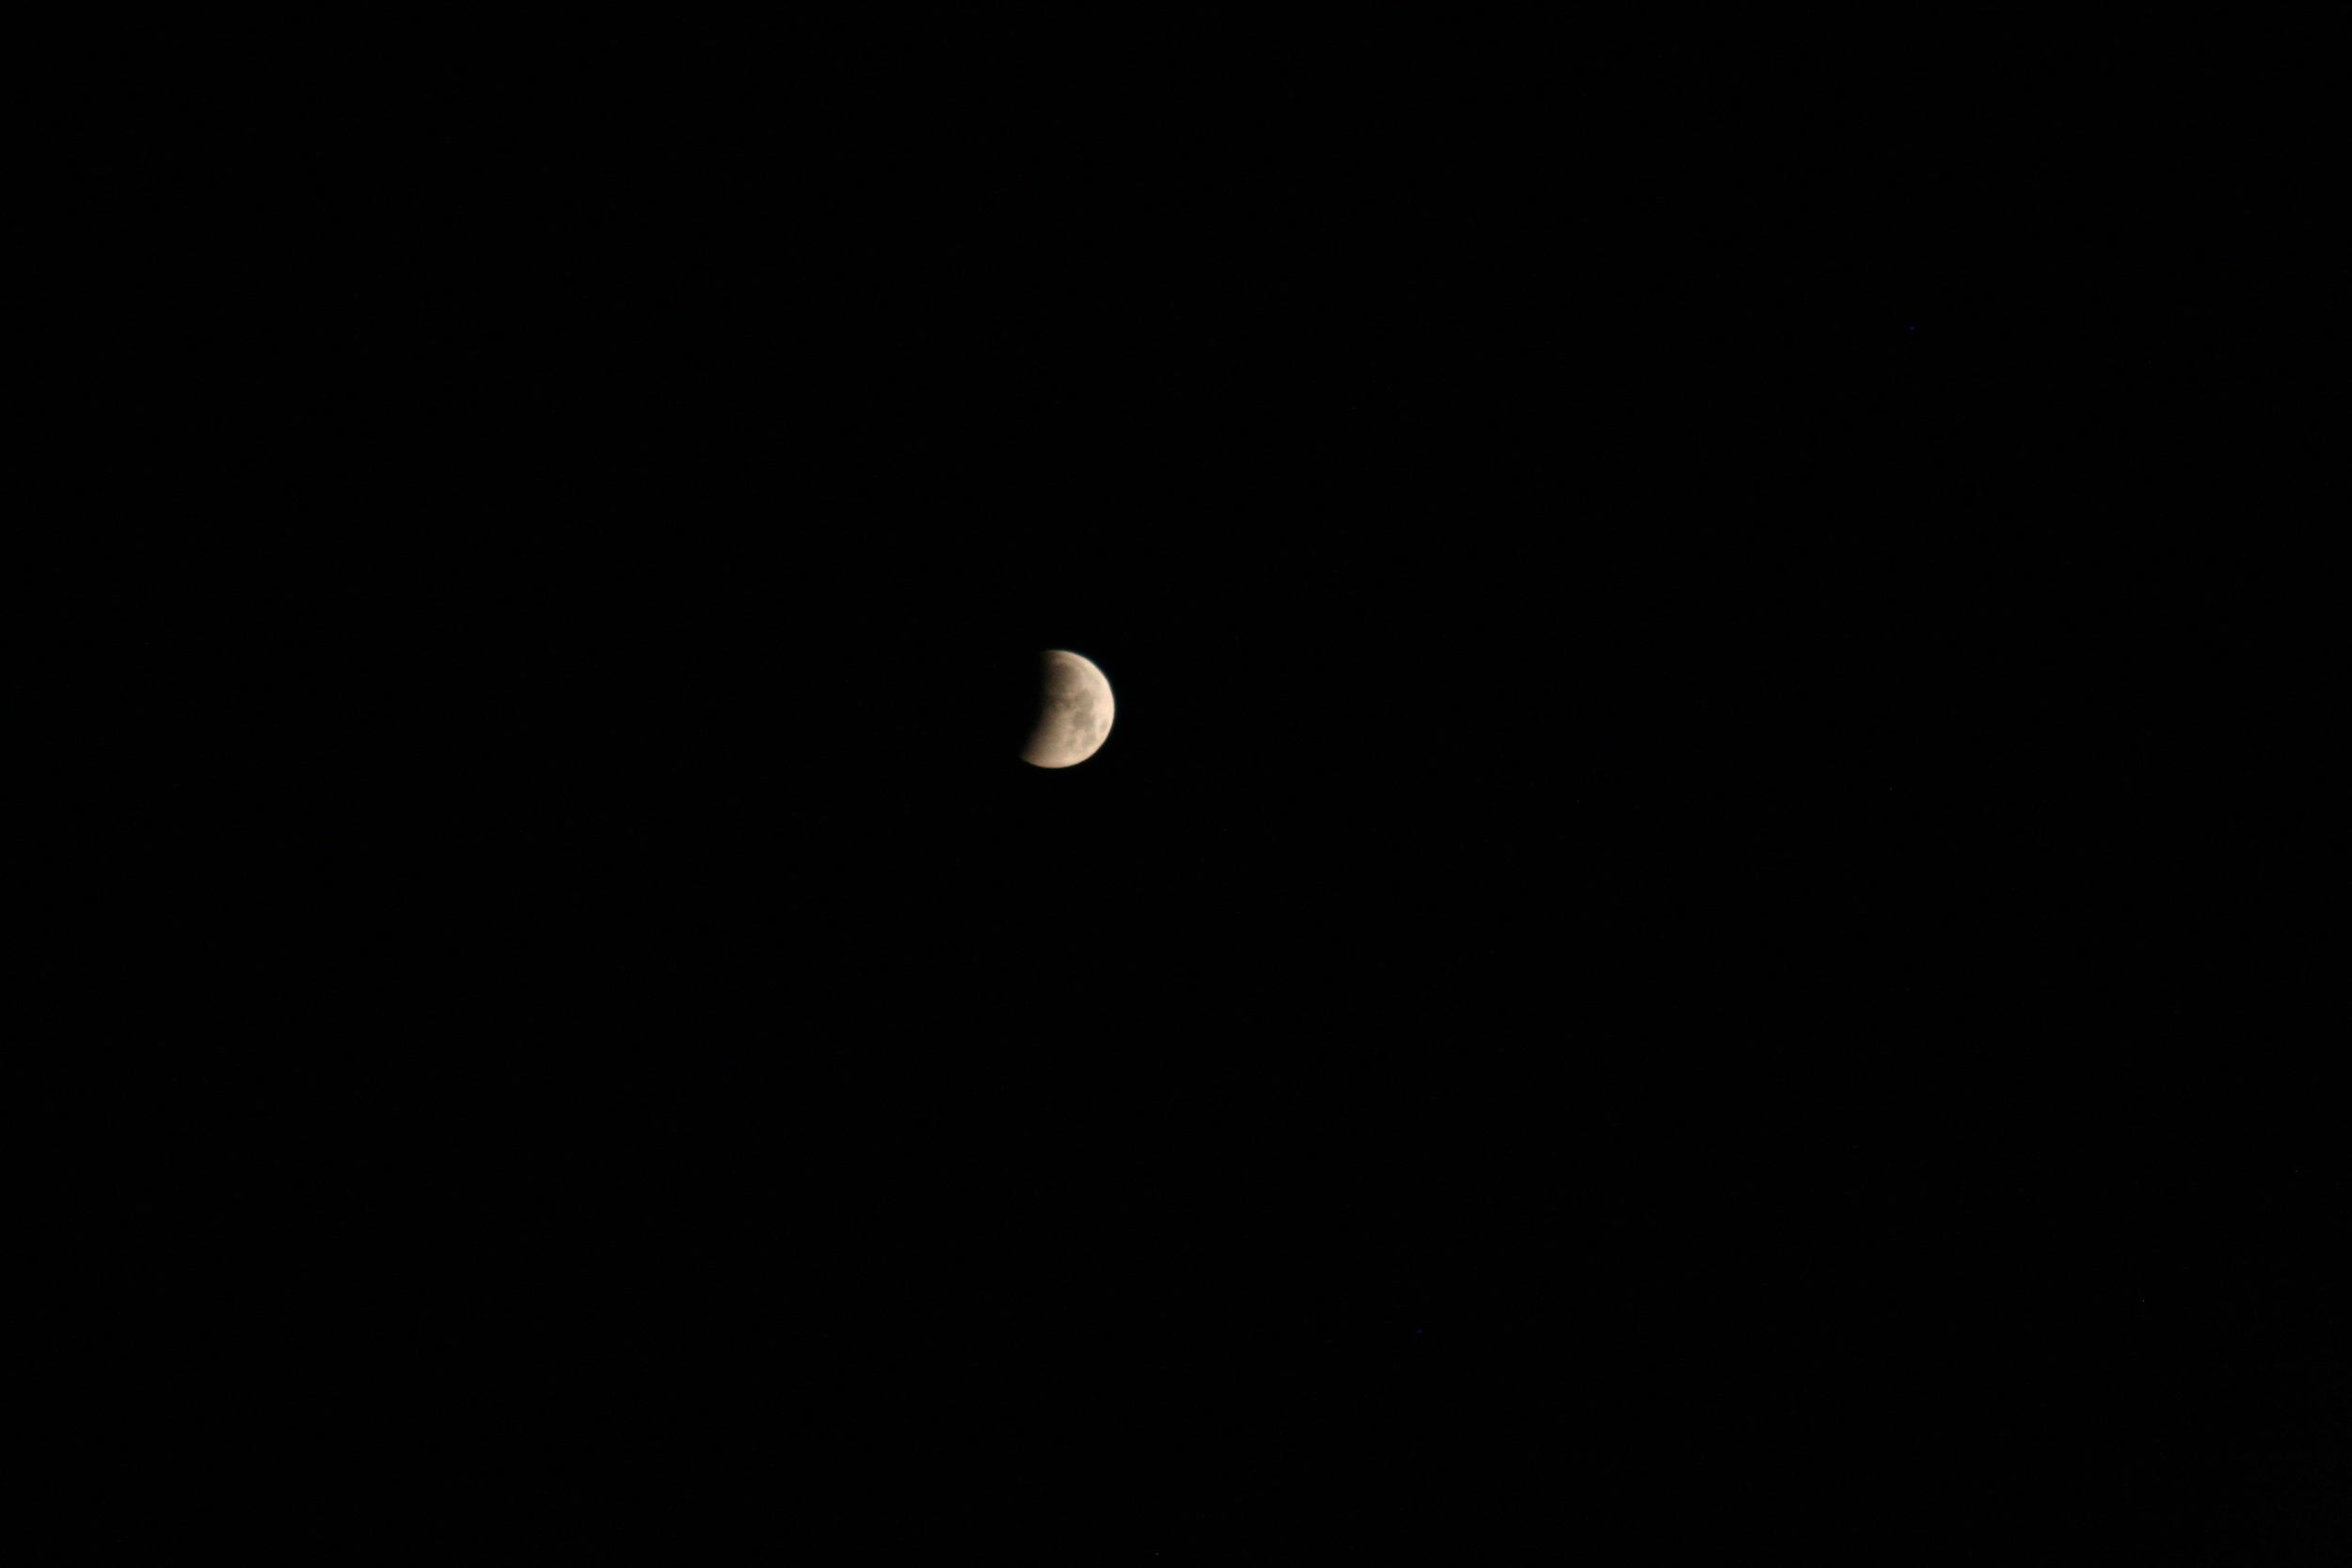 Lunar Eclipse April 20152.jpg